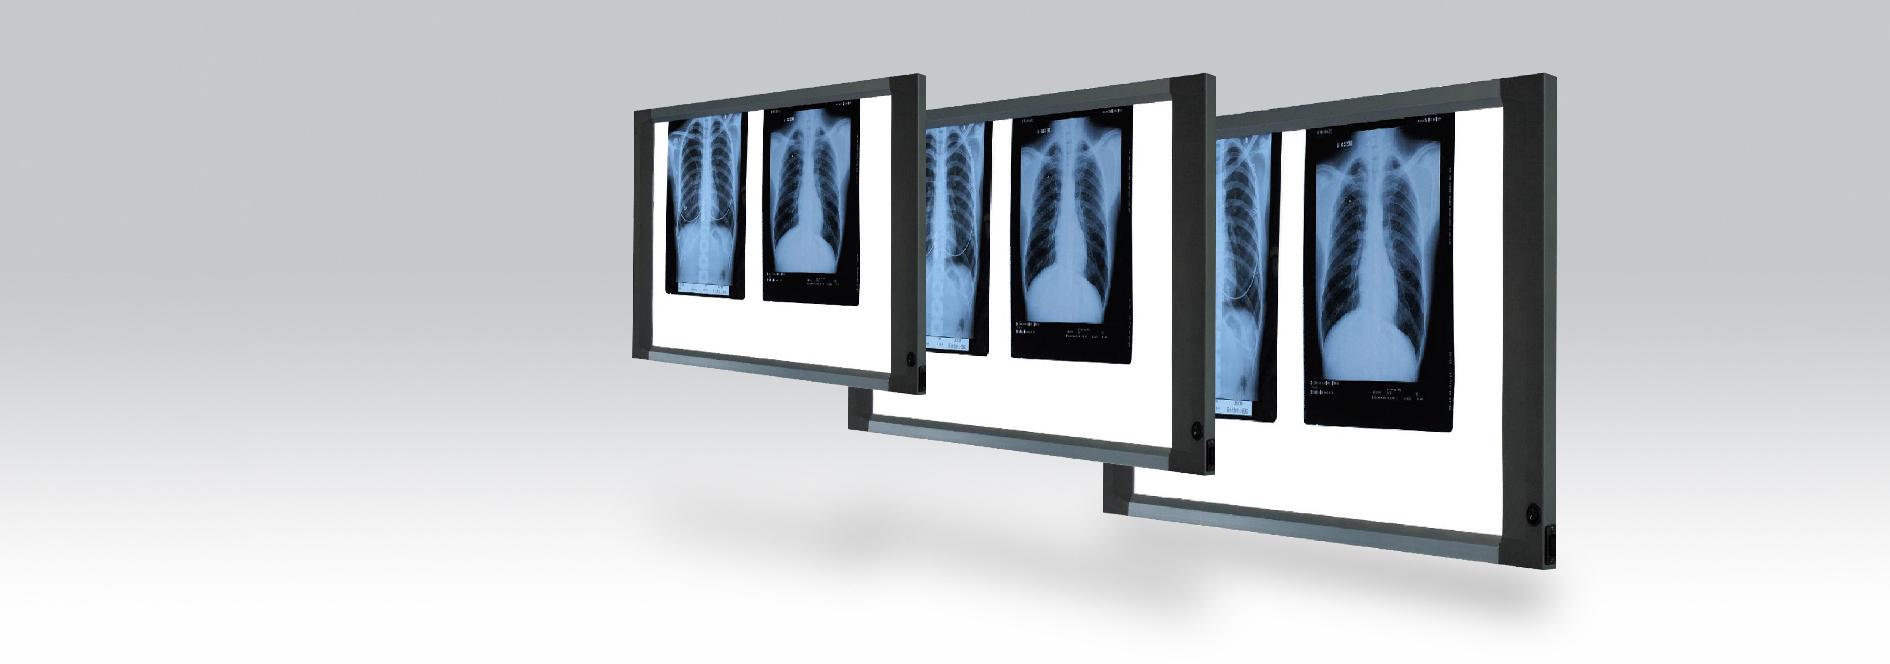 X-Ray Viewers